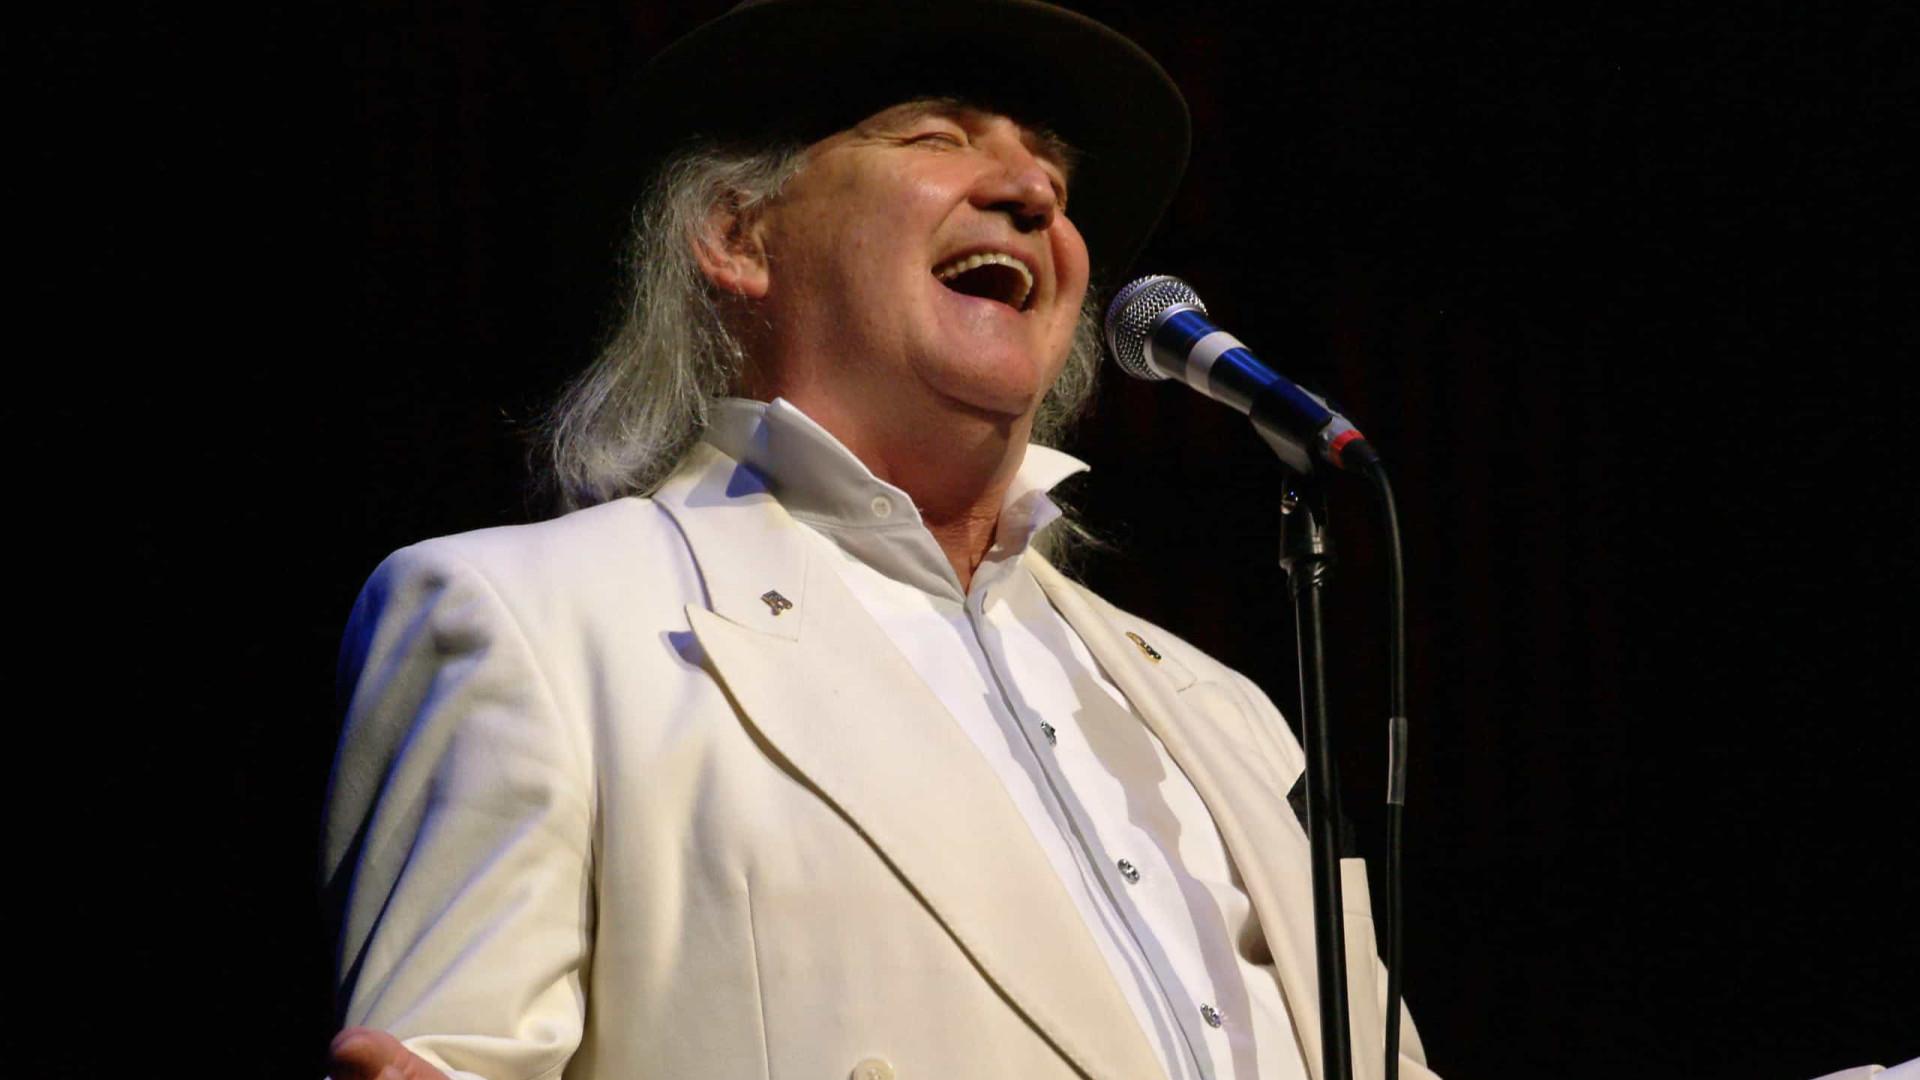 Wayne Fontana, cantor de 'Game of Love', morre aos 74 anos